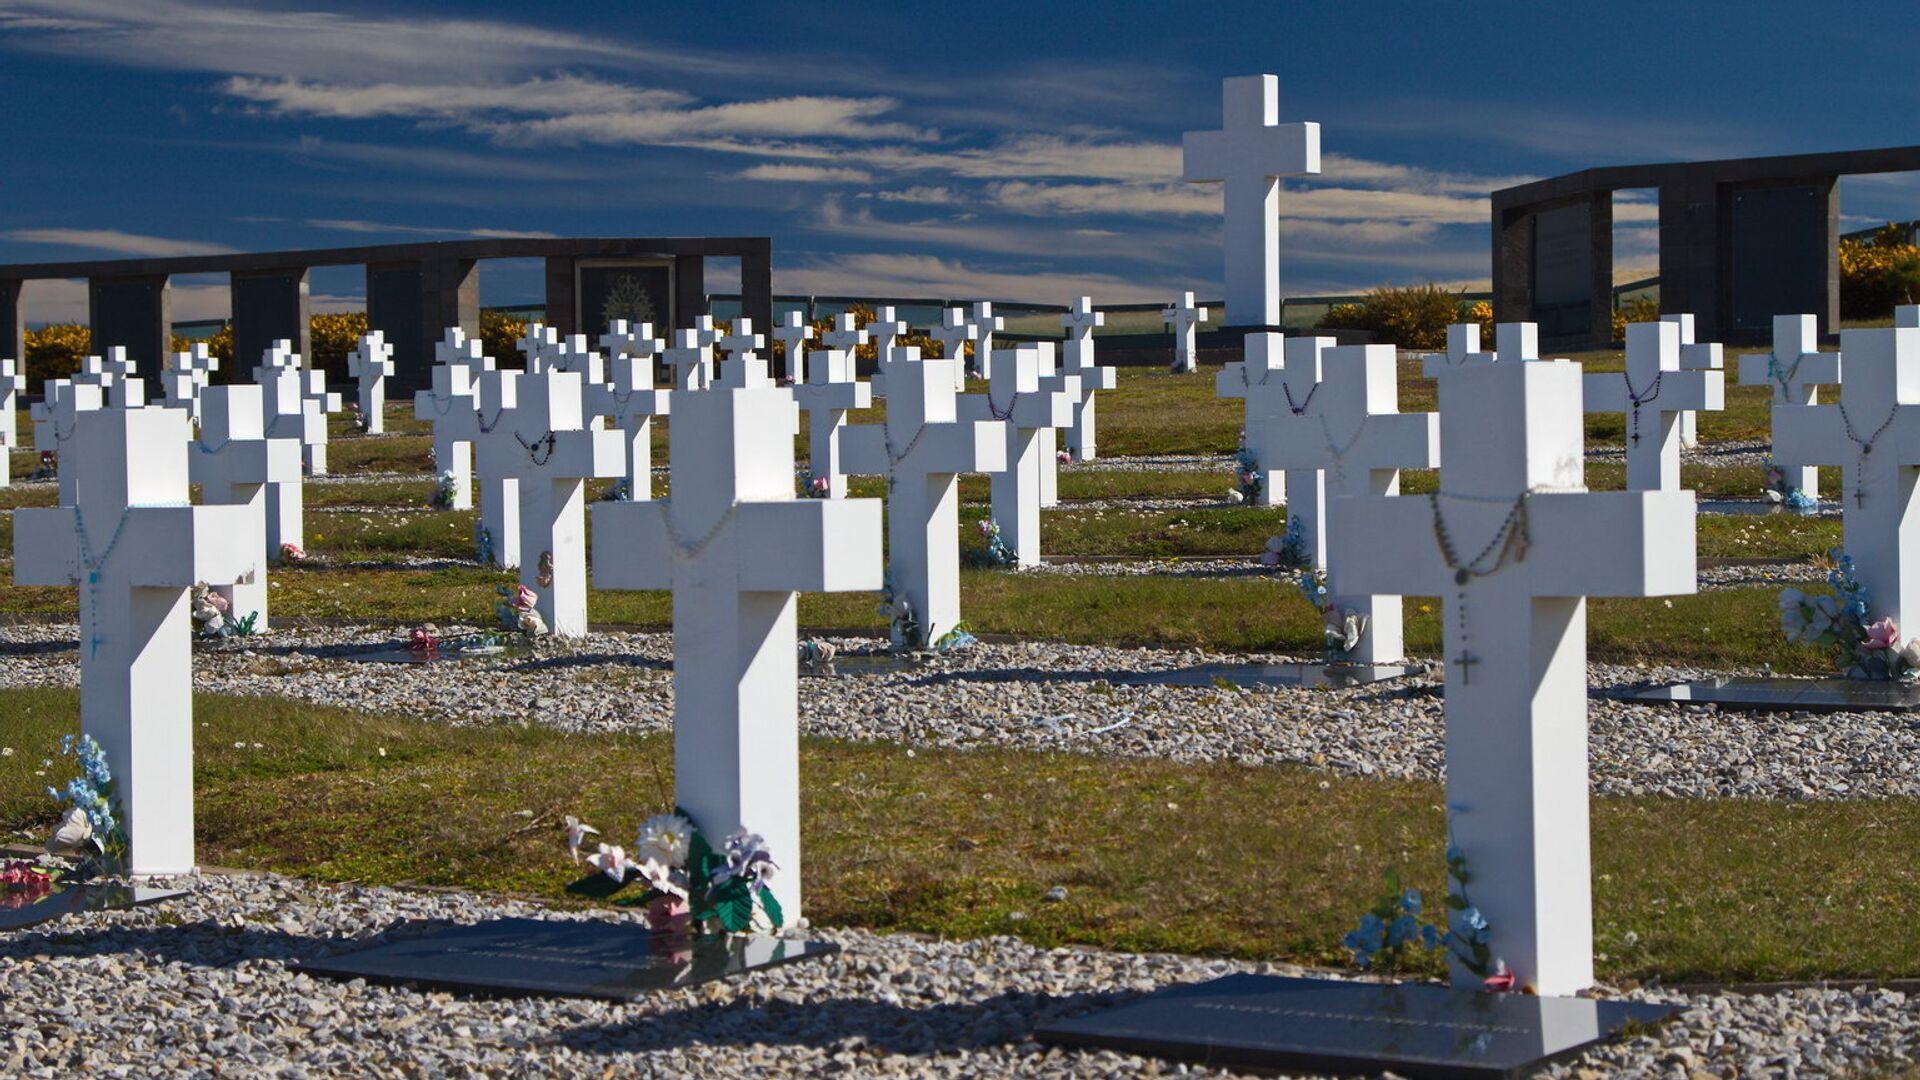 Cementerio de Darwin - Sputnik Mundo, 1920, 14.09.2021